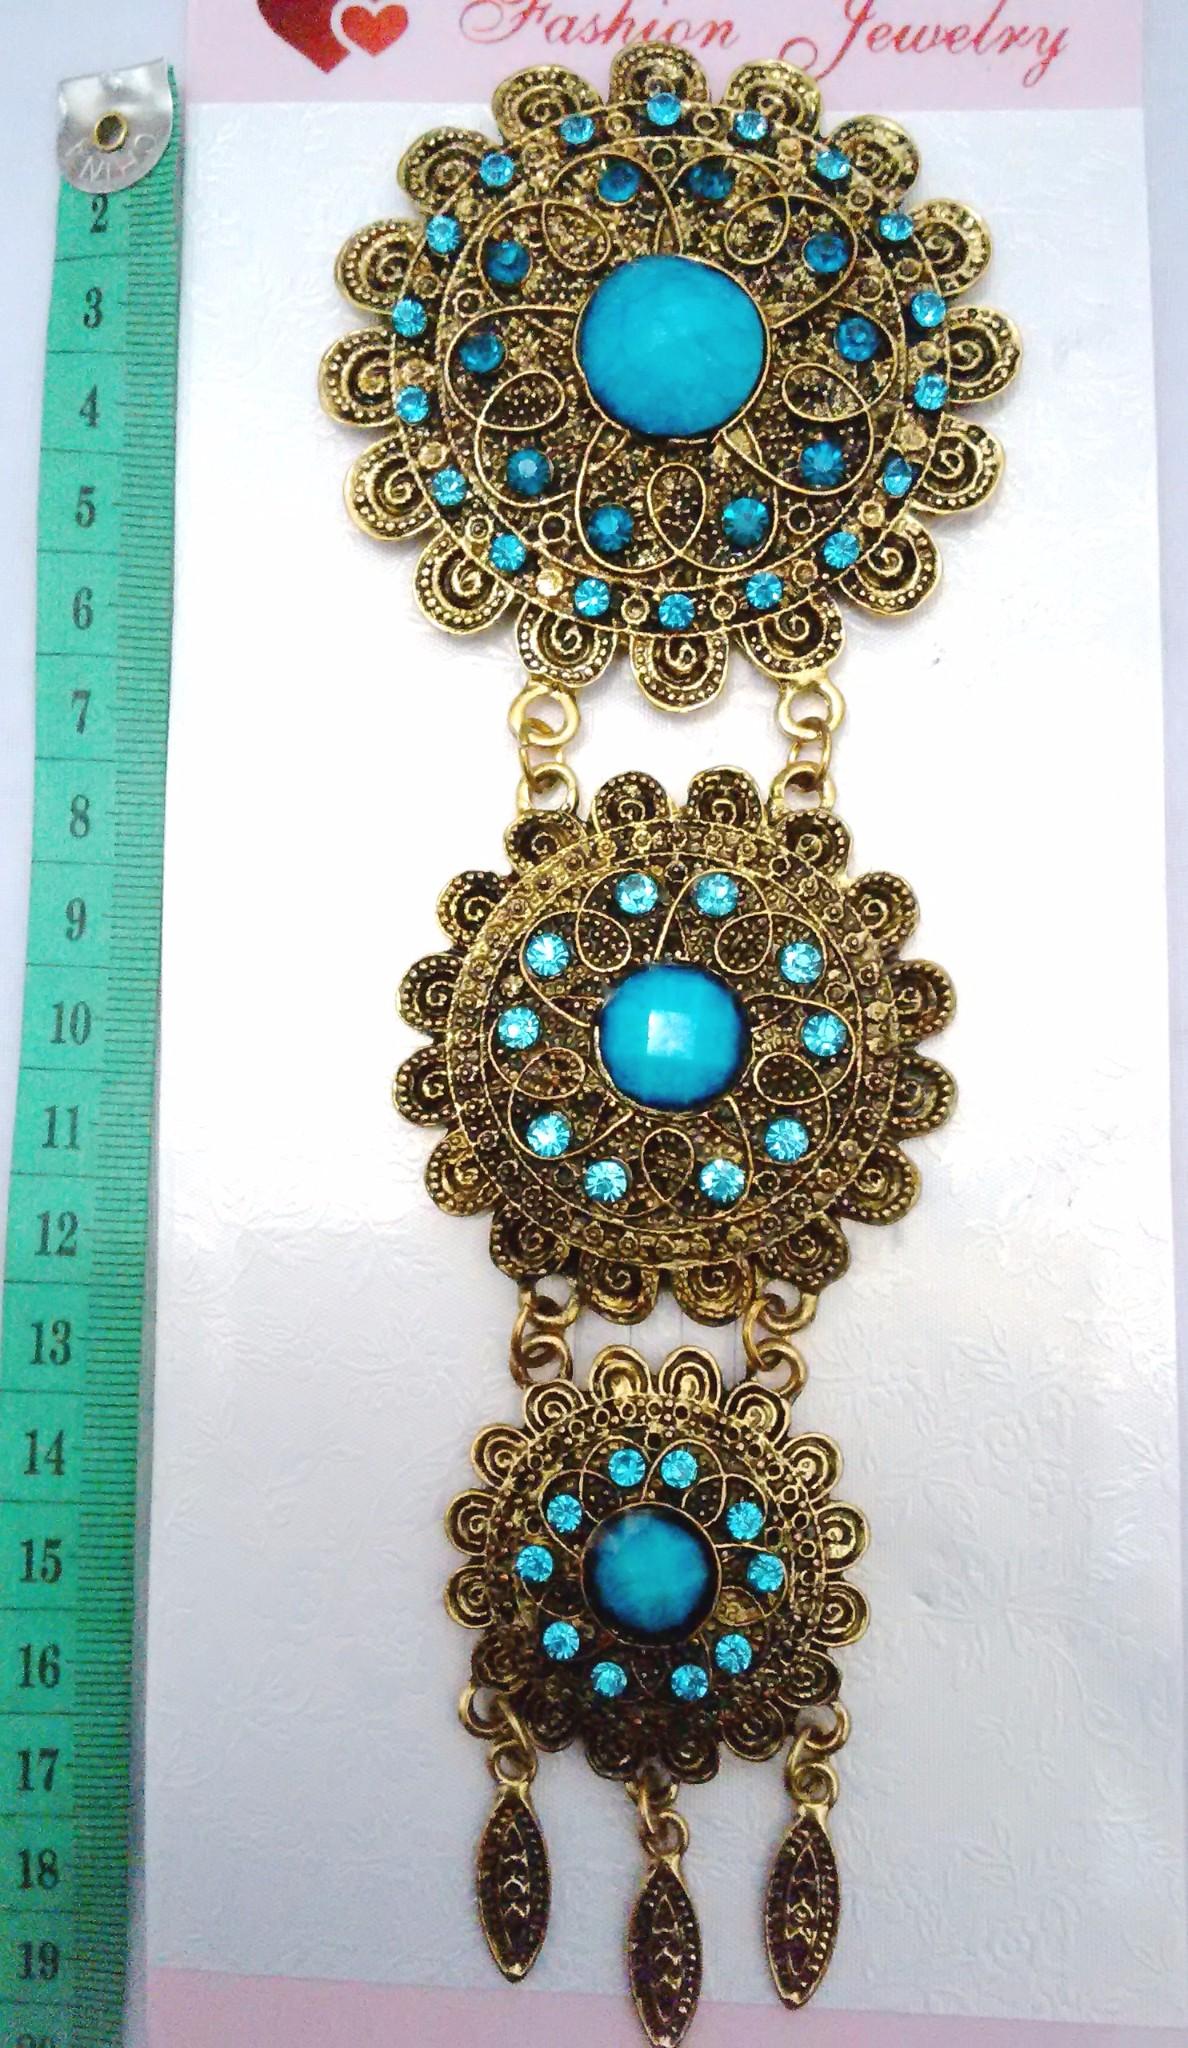 Bros Etnik panjang Tingkat Bunga Biru untuk hijab/kebaya/dress/jas